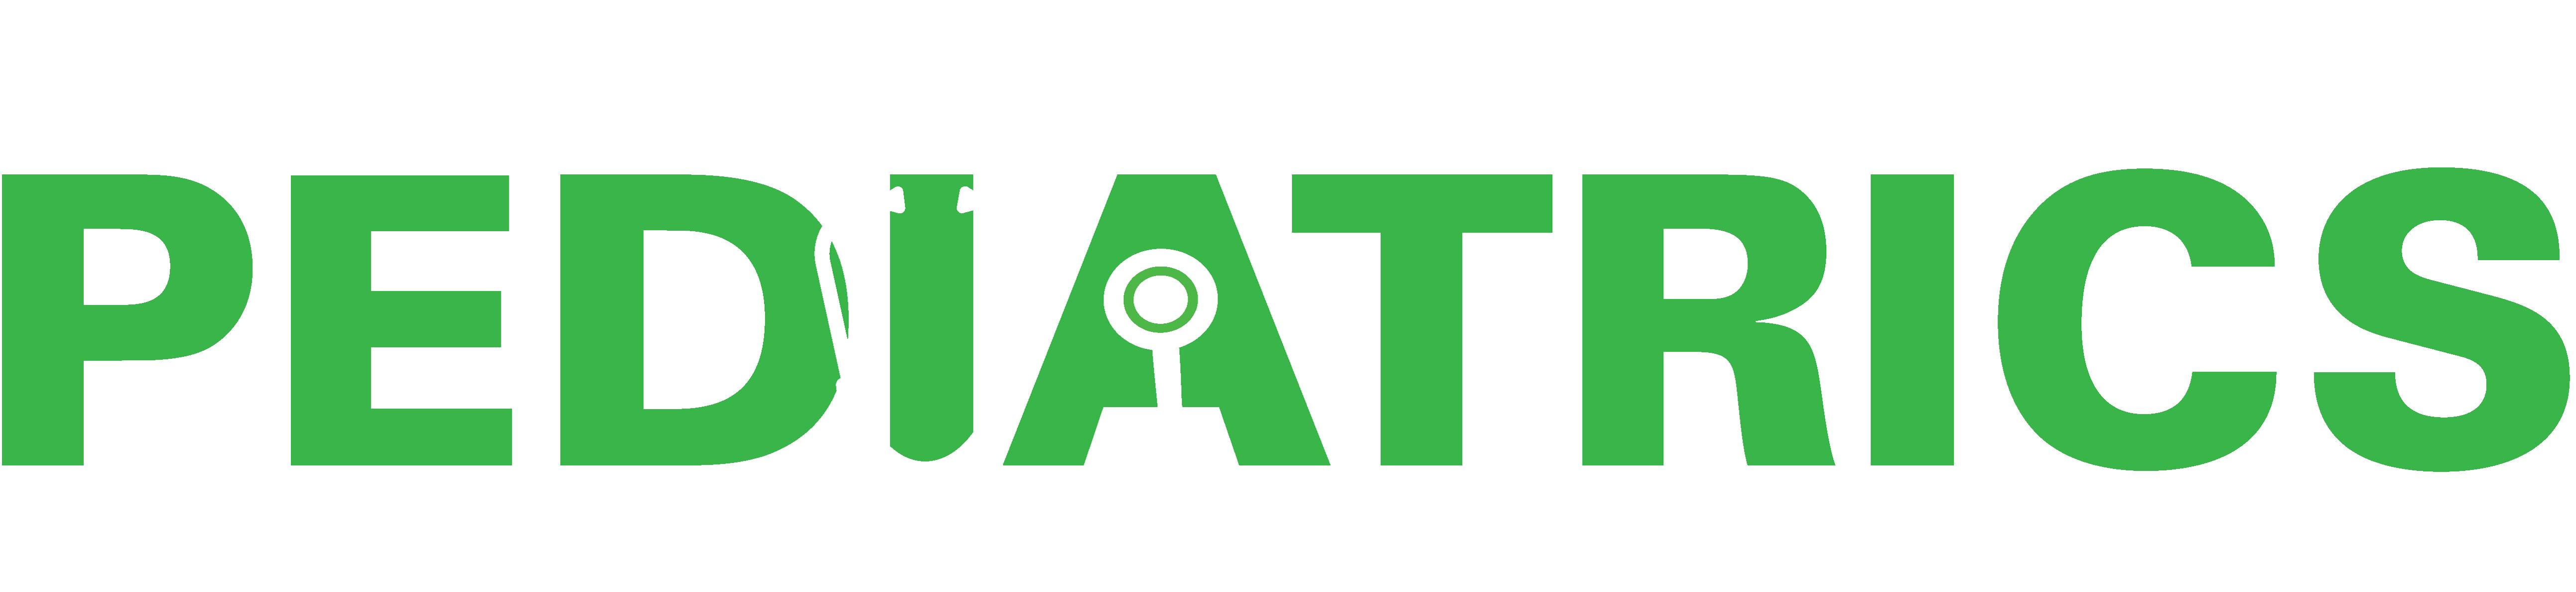 Parent education northside cherokee. Shot clipart pediatrics